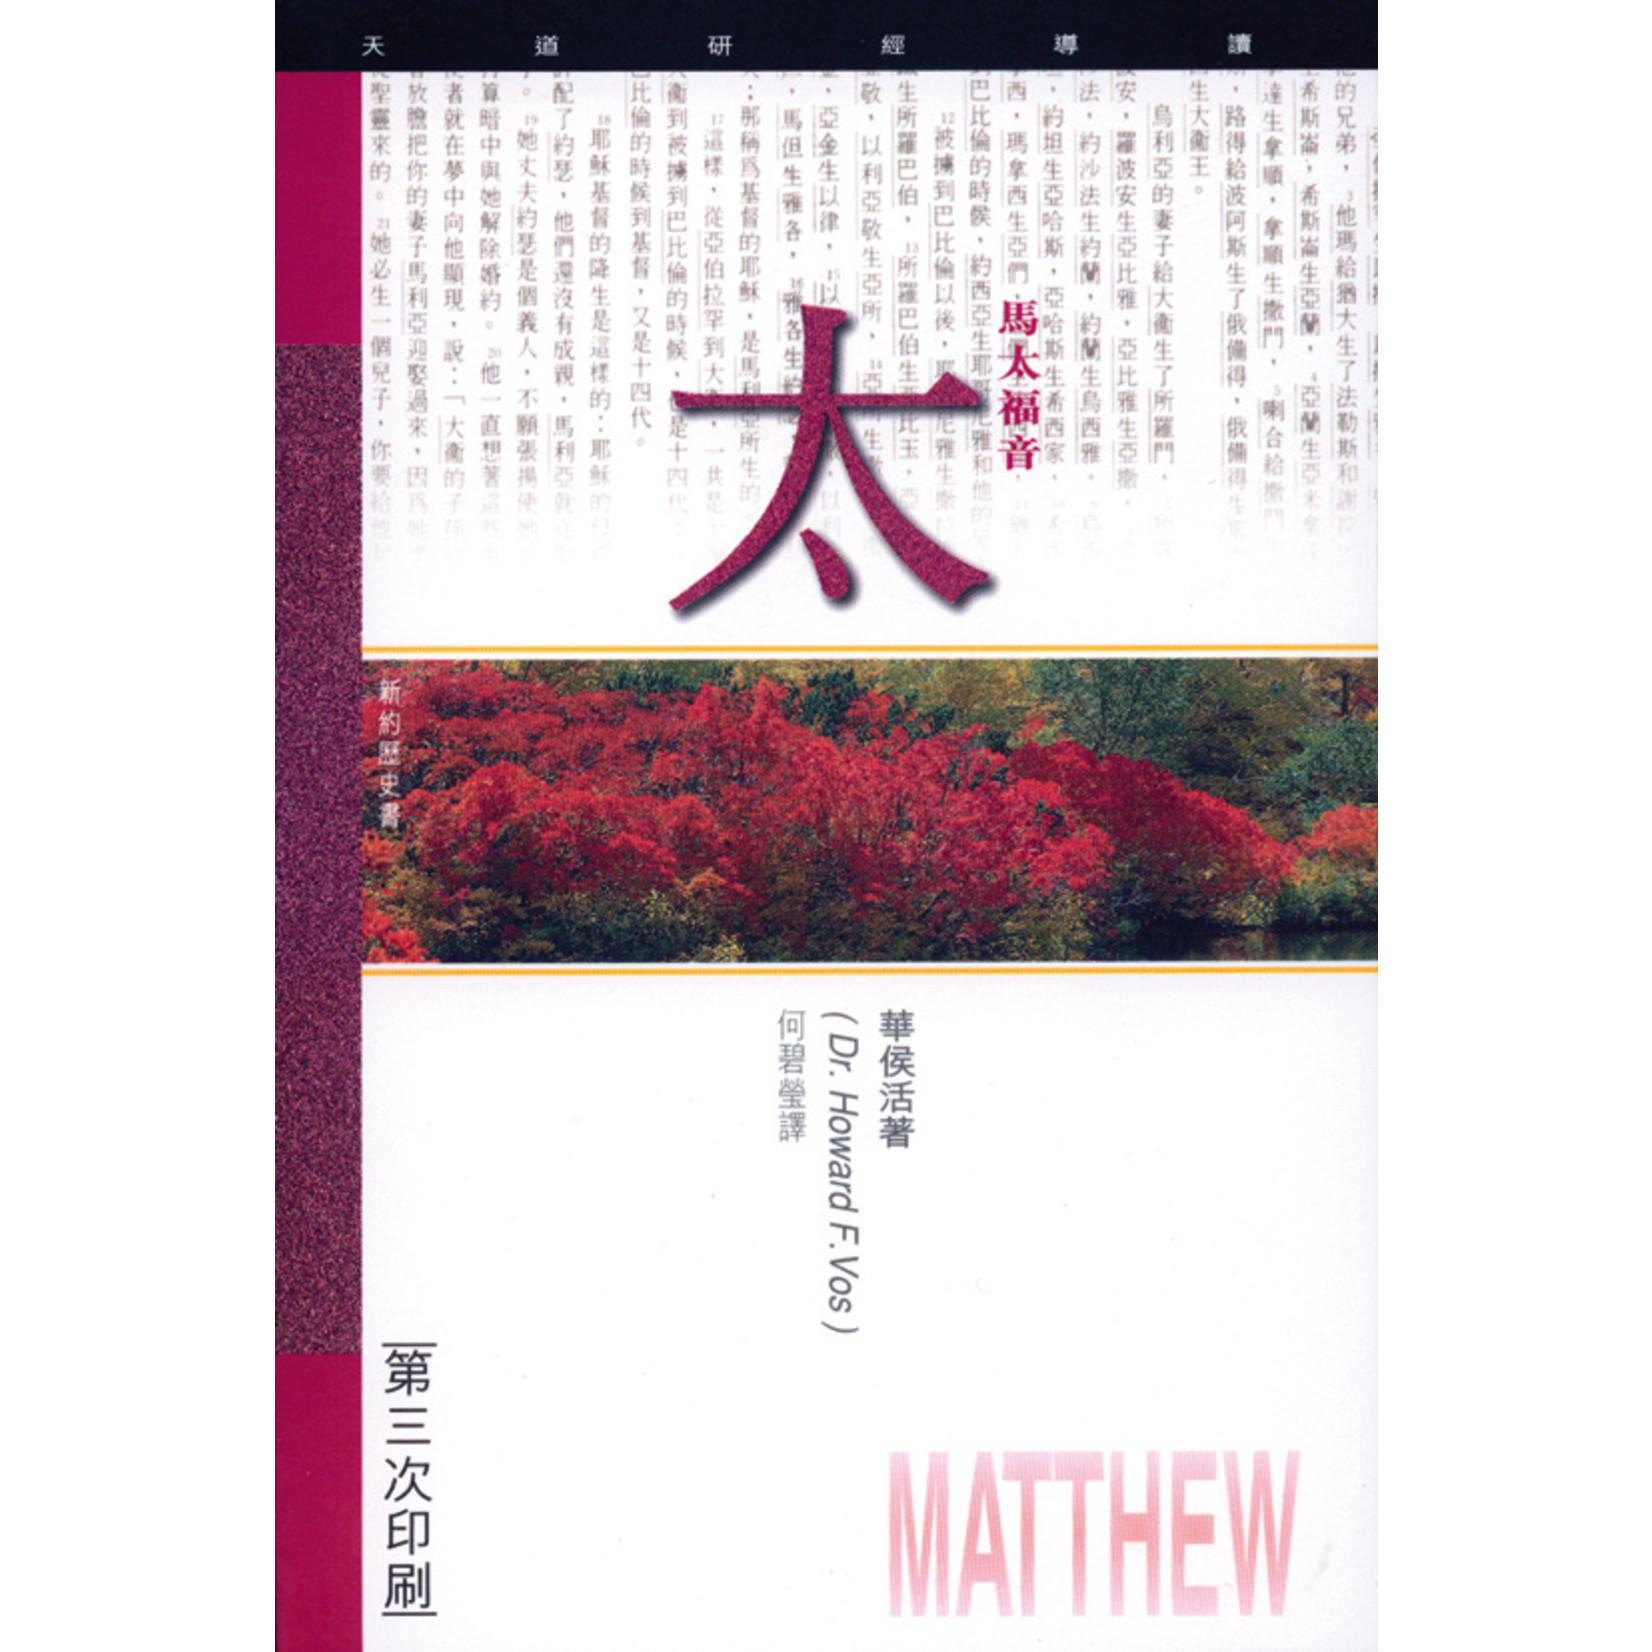 天道書樓 Tien Dao Publishing House 天道研經導讀:馬太福音